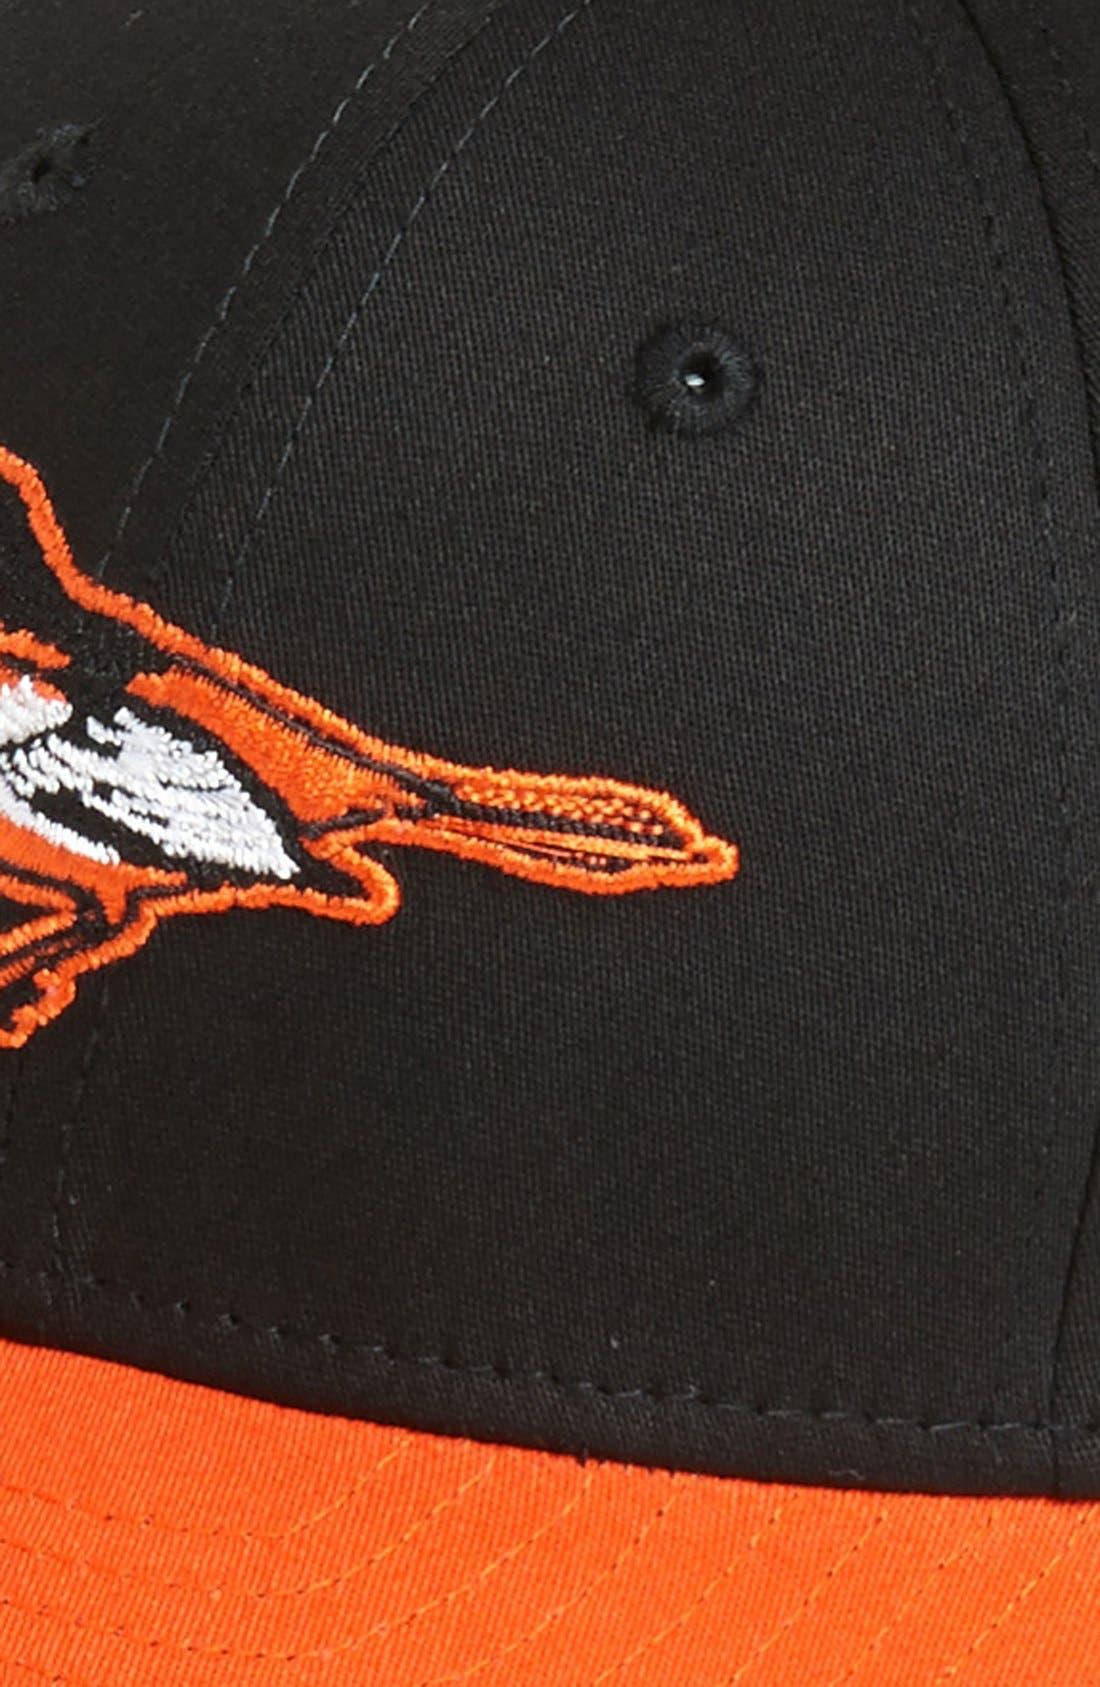 Alternate Image 2  - New Era Cap 'Baltimore Orioles - Tie Breaker' Baseball Cap (Big Boys)